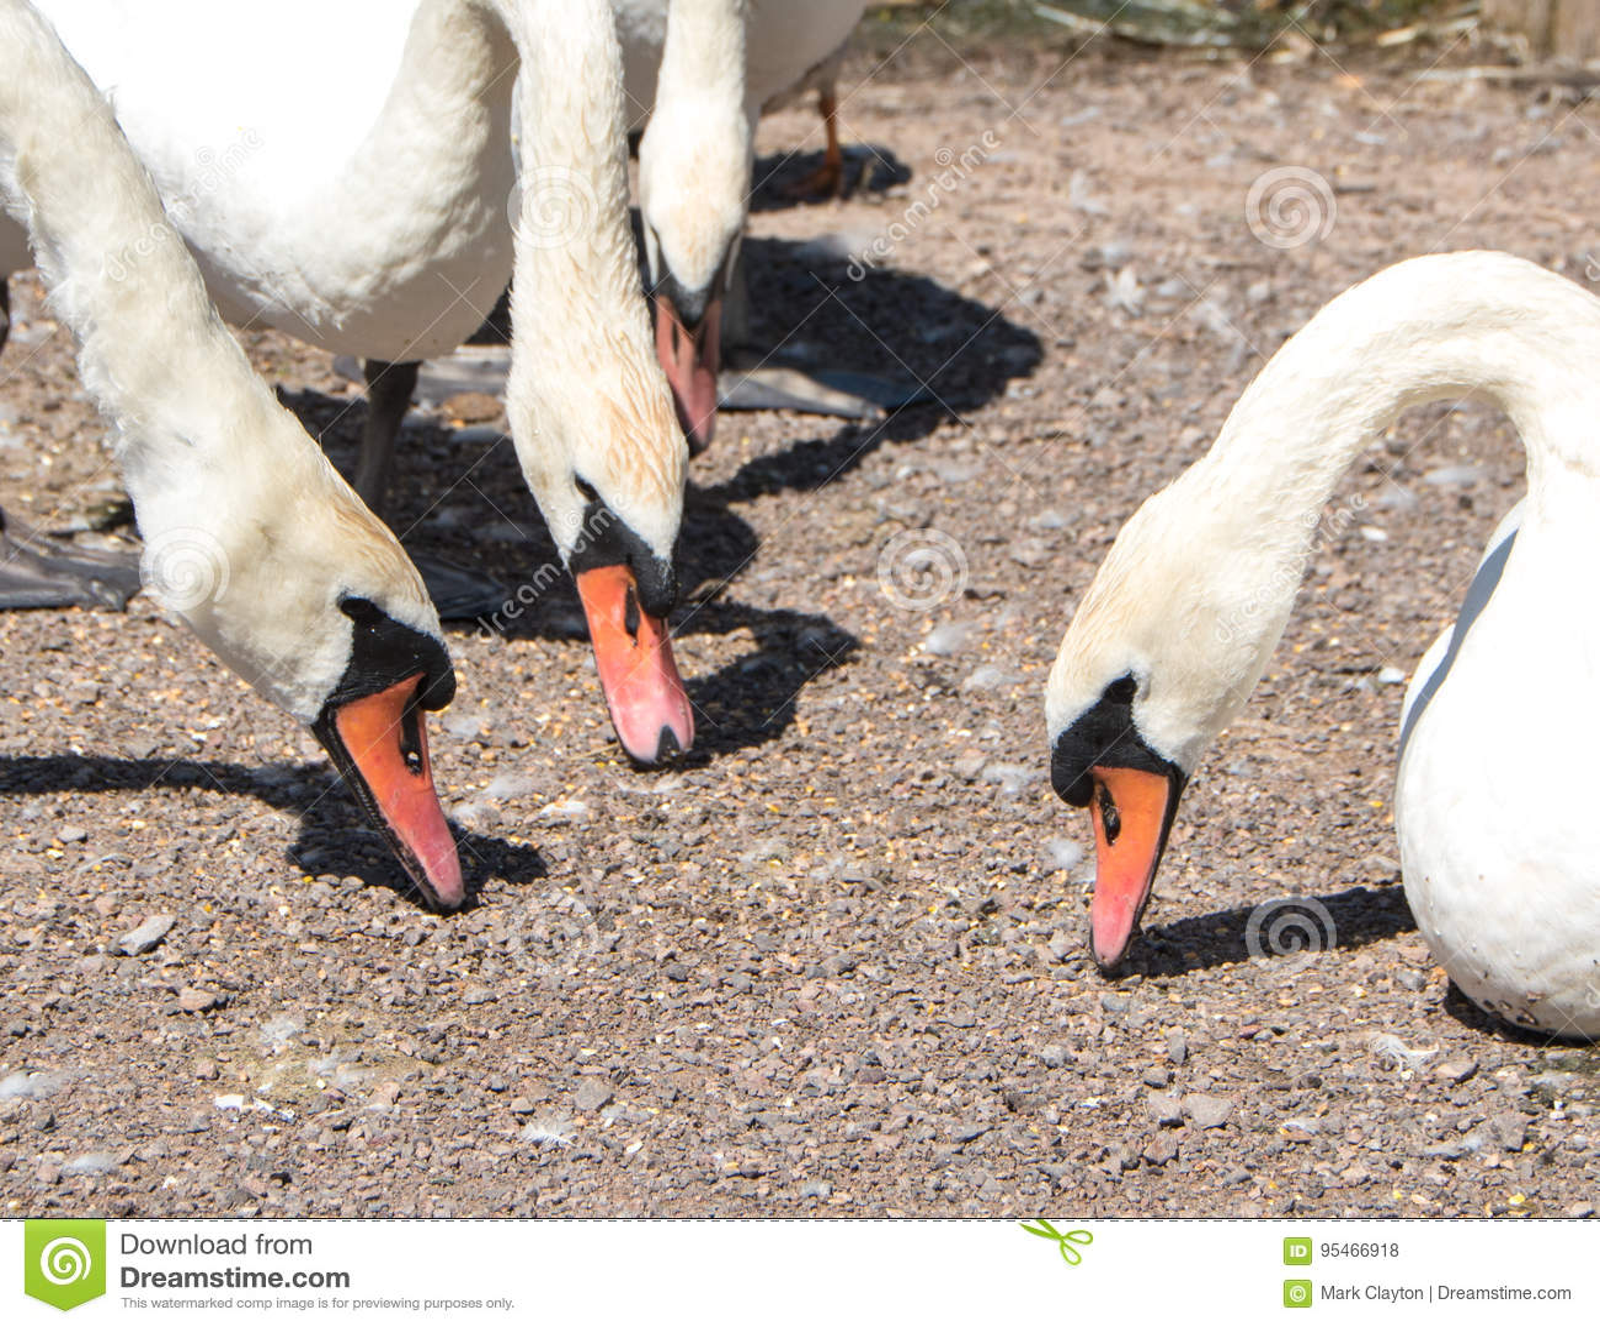 Group of feeding swans